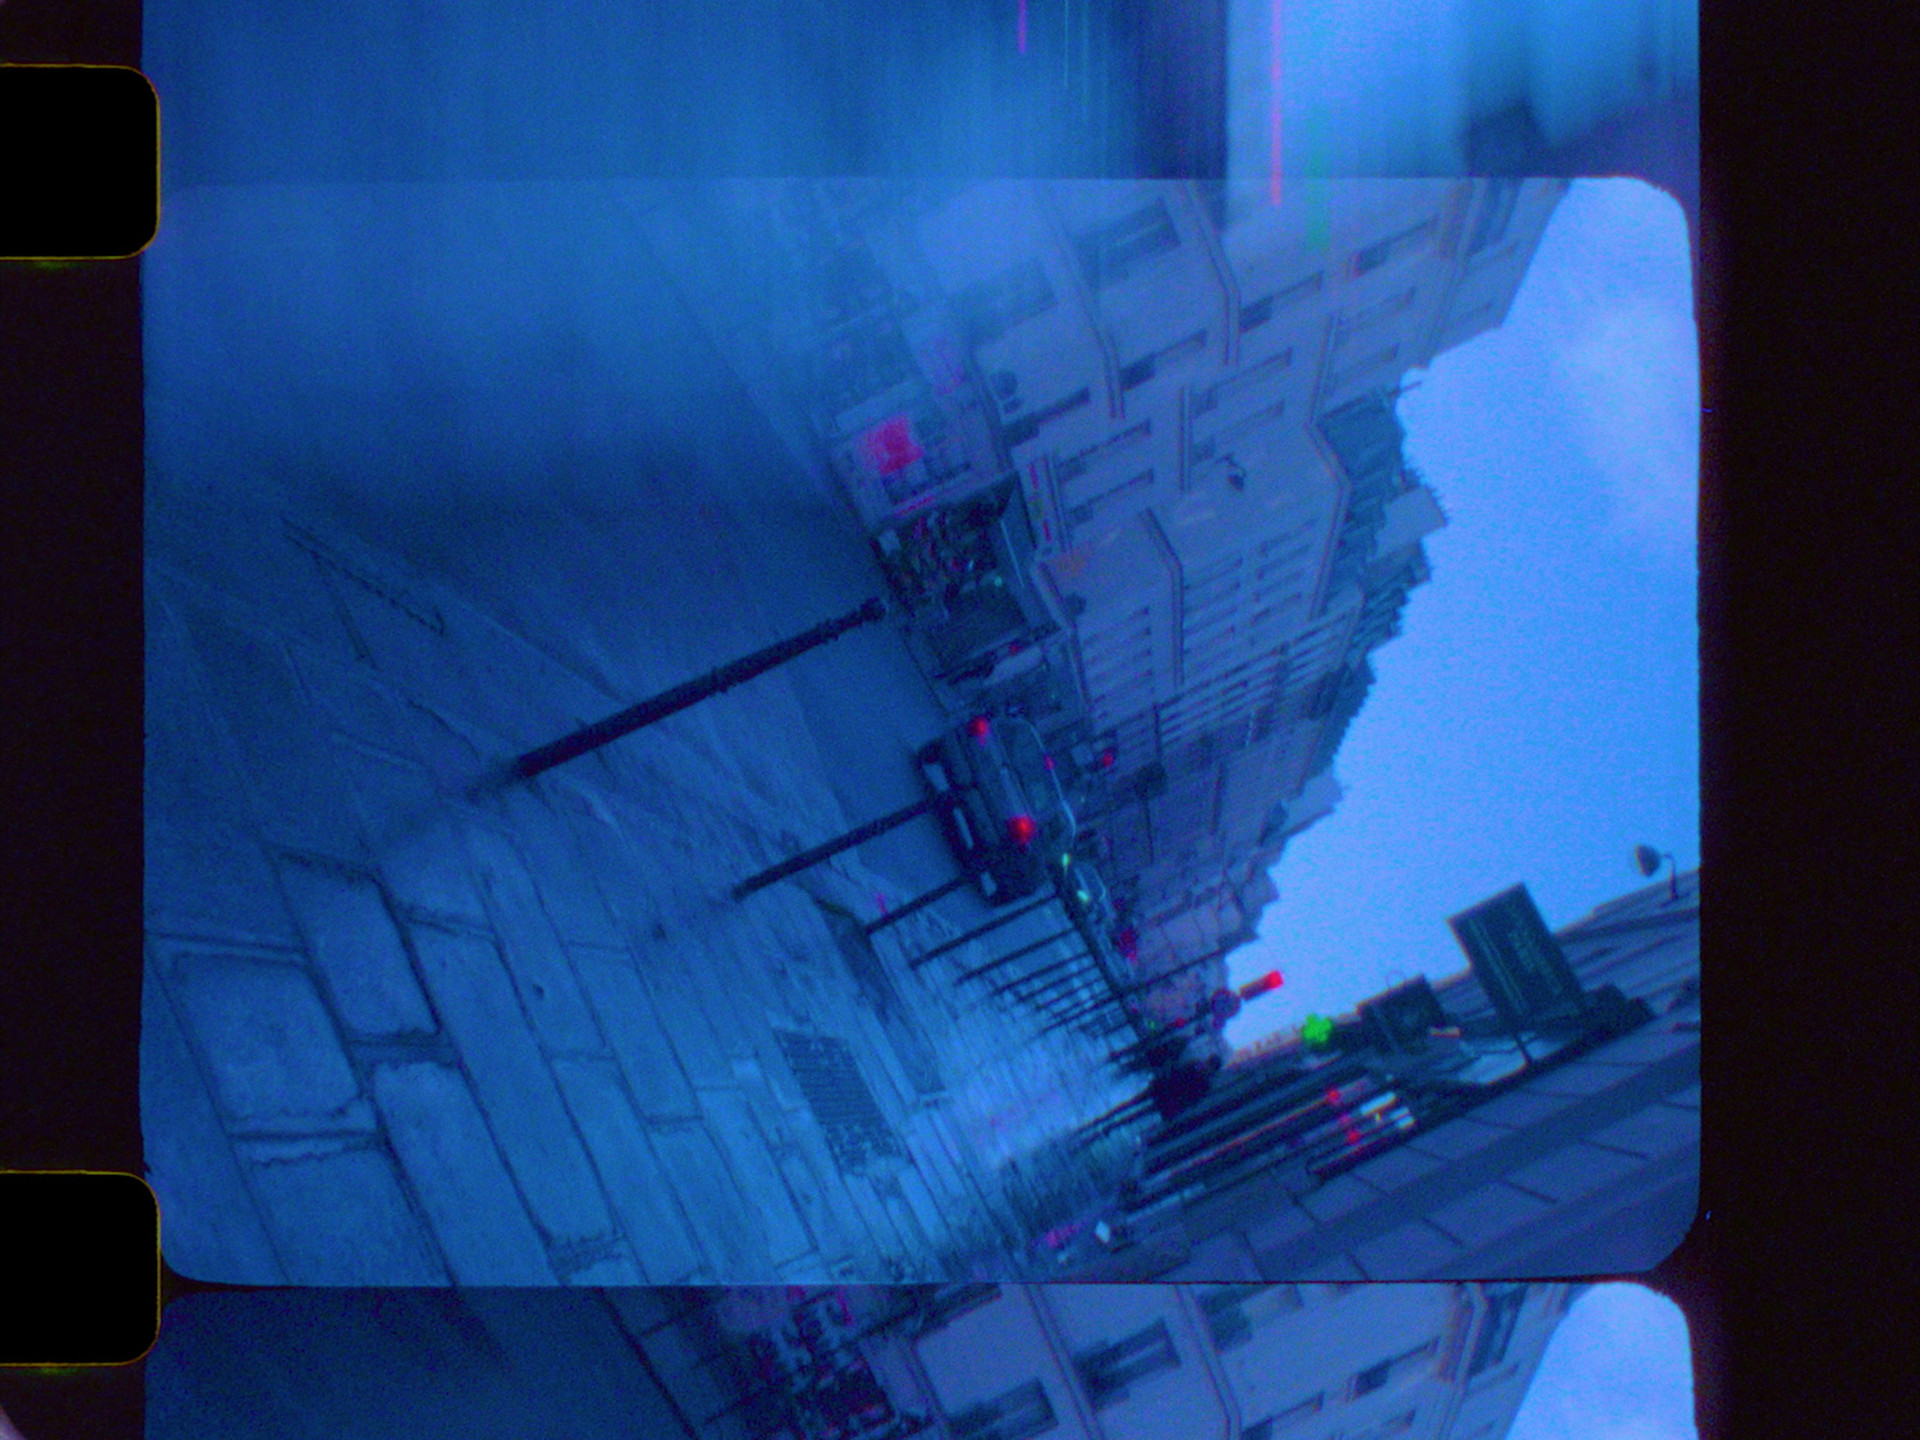 LANVIN_06_trim.jpg